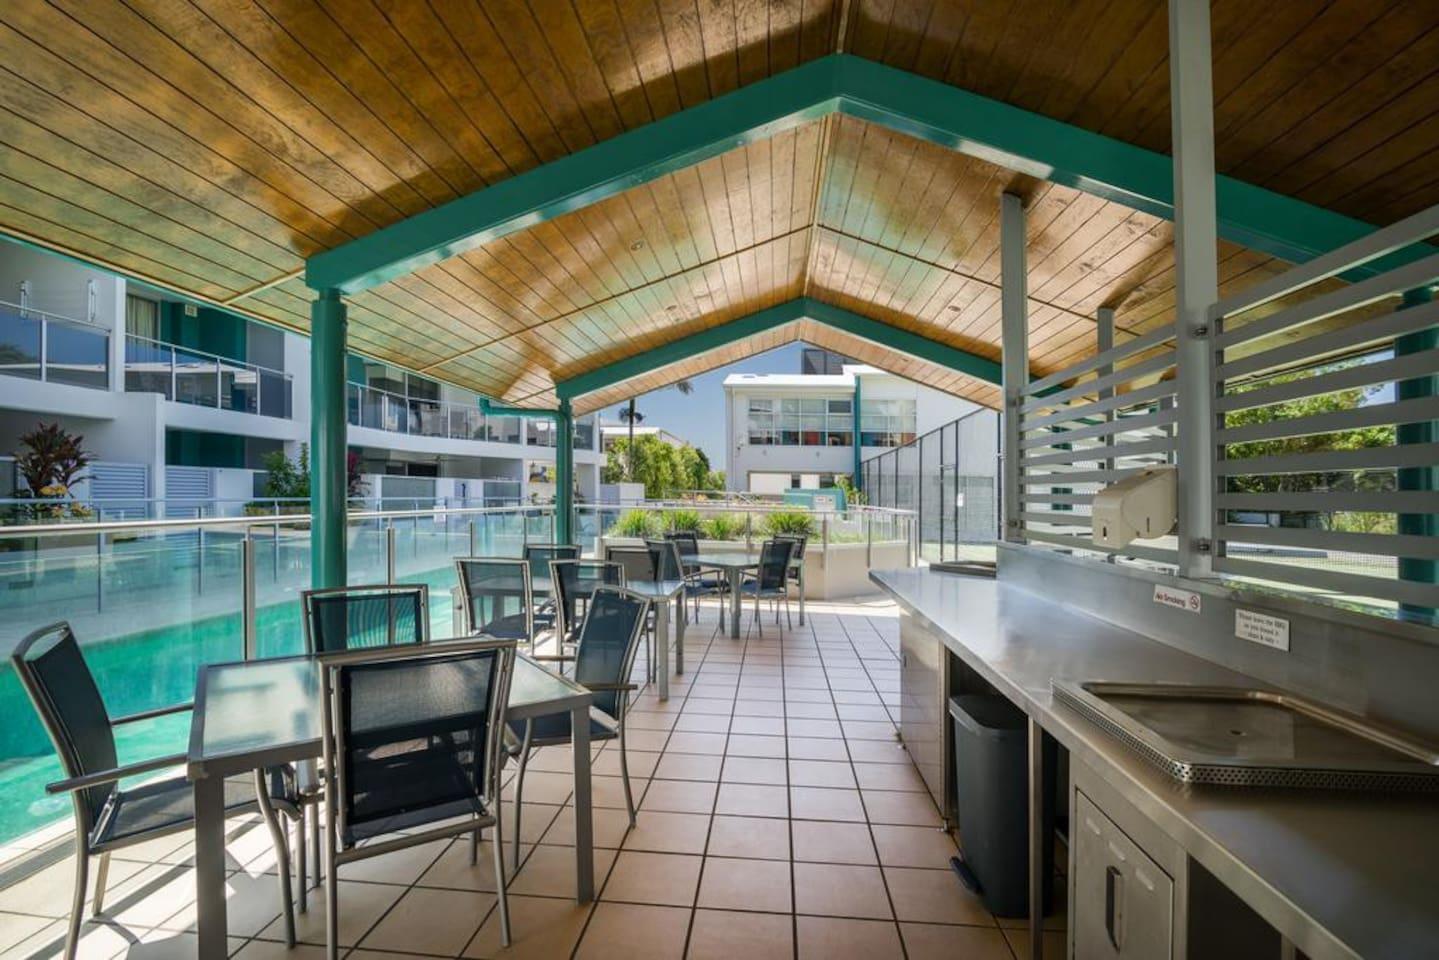 Apartment 2BR Coolum Beach    Rooftop Terrace   Spa   Tennis   Pool photo 26289862